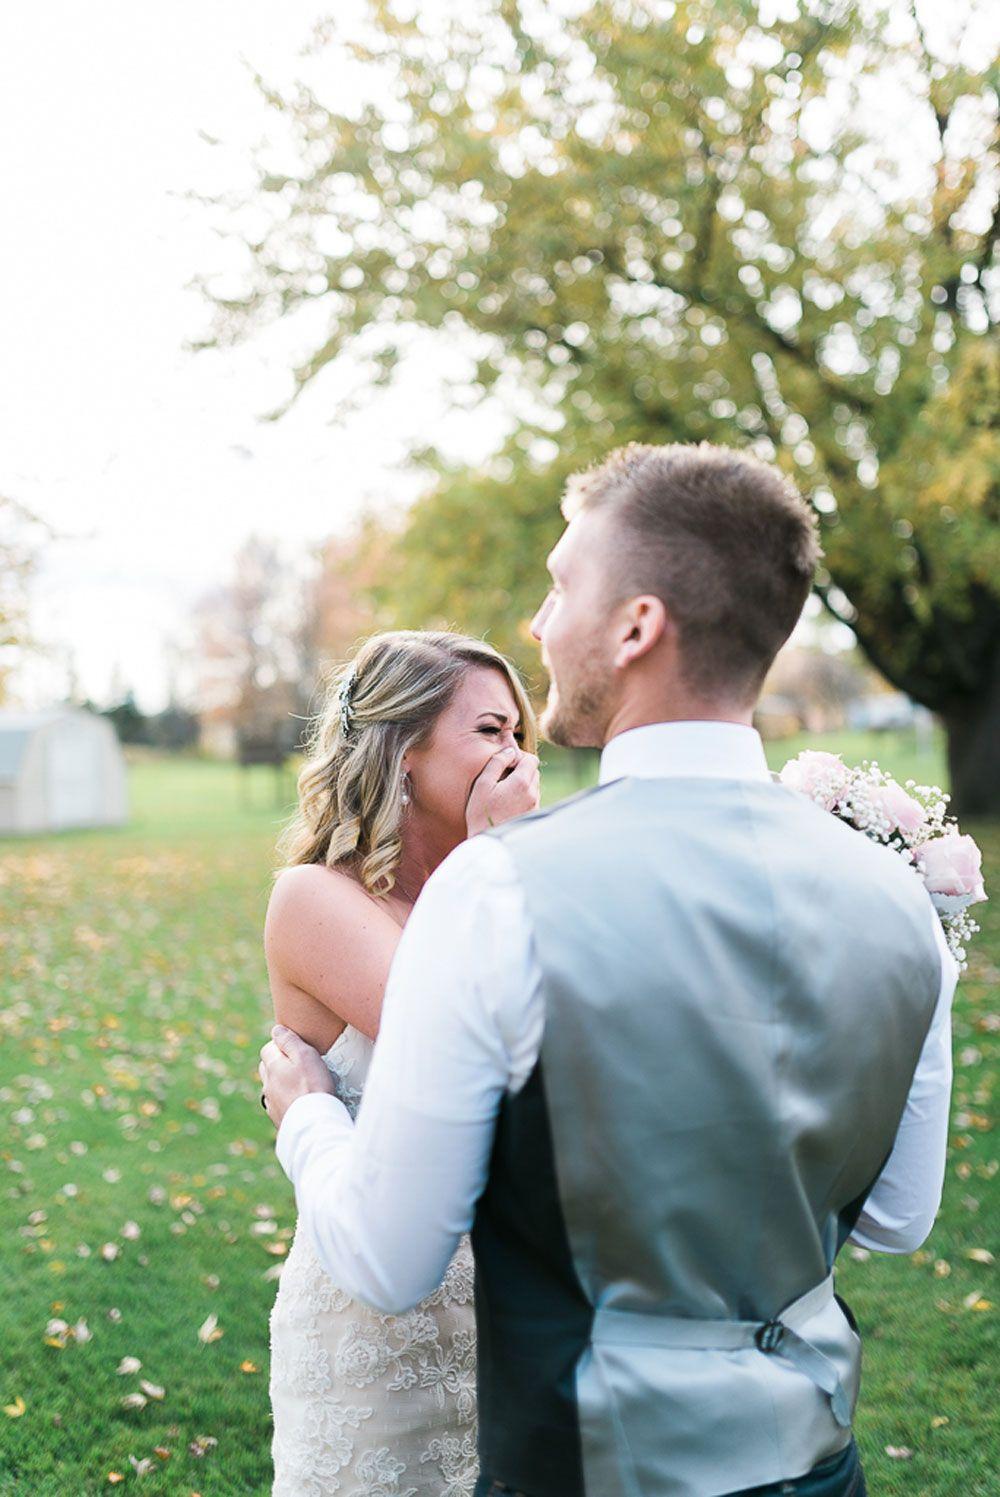 Genius Wedding Photographer Calls Client Ugliest Bride Ever on Facebook